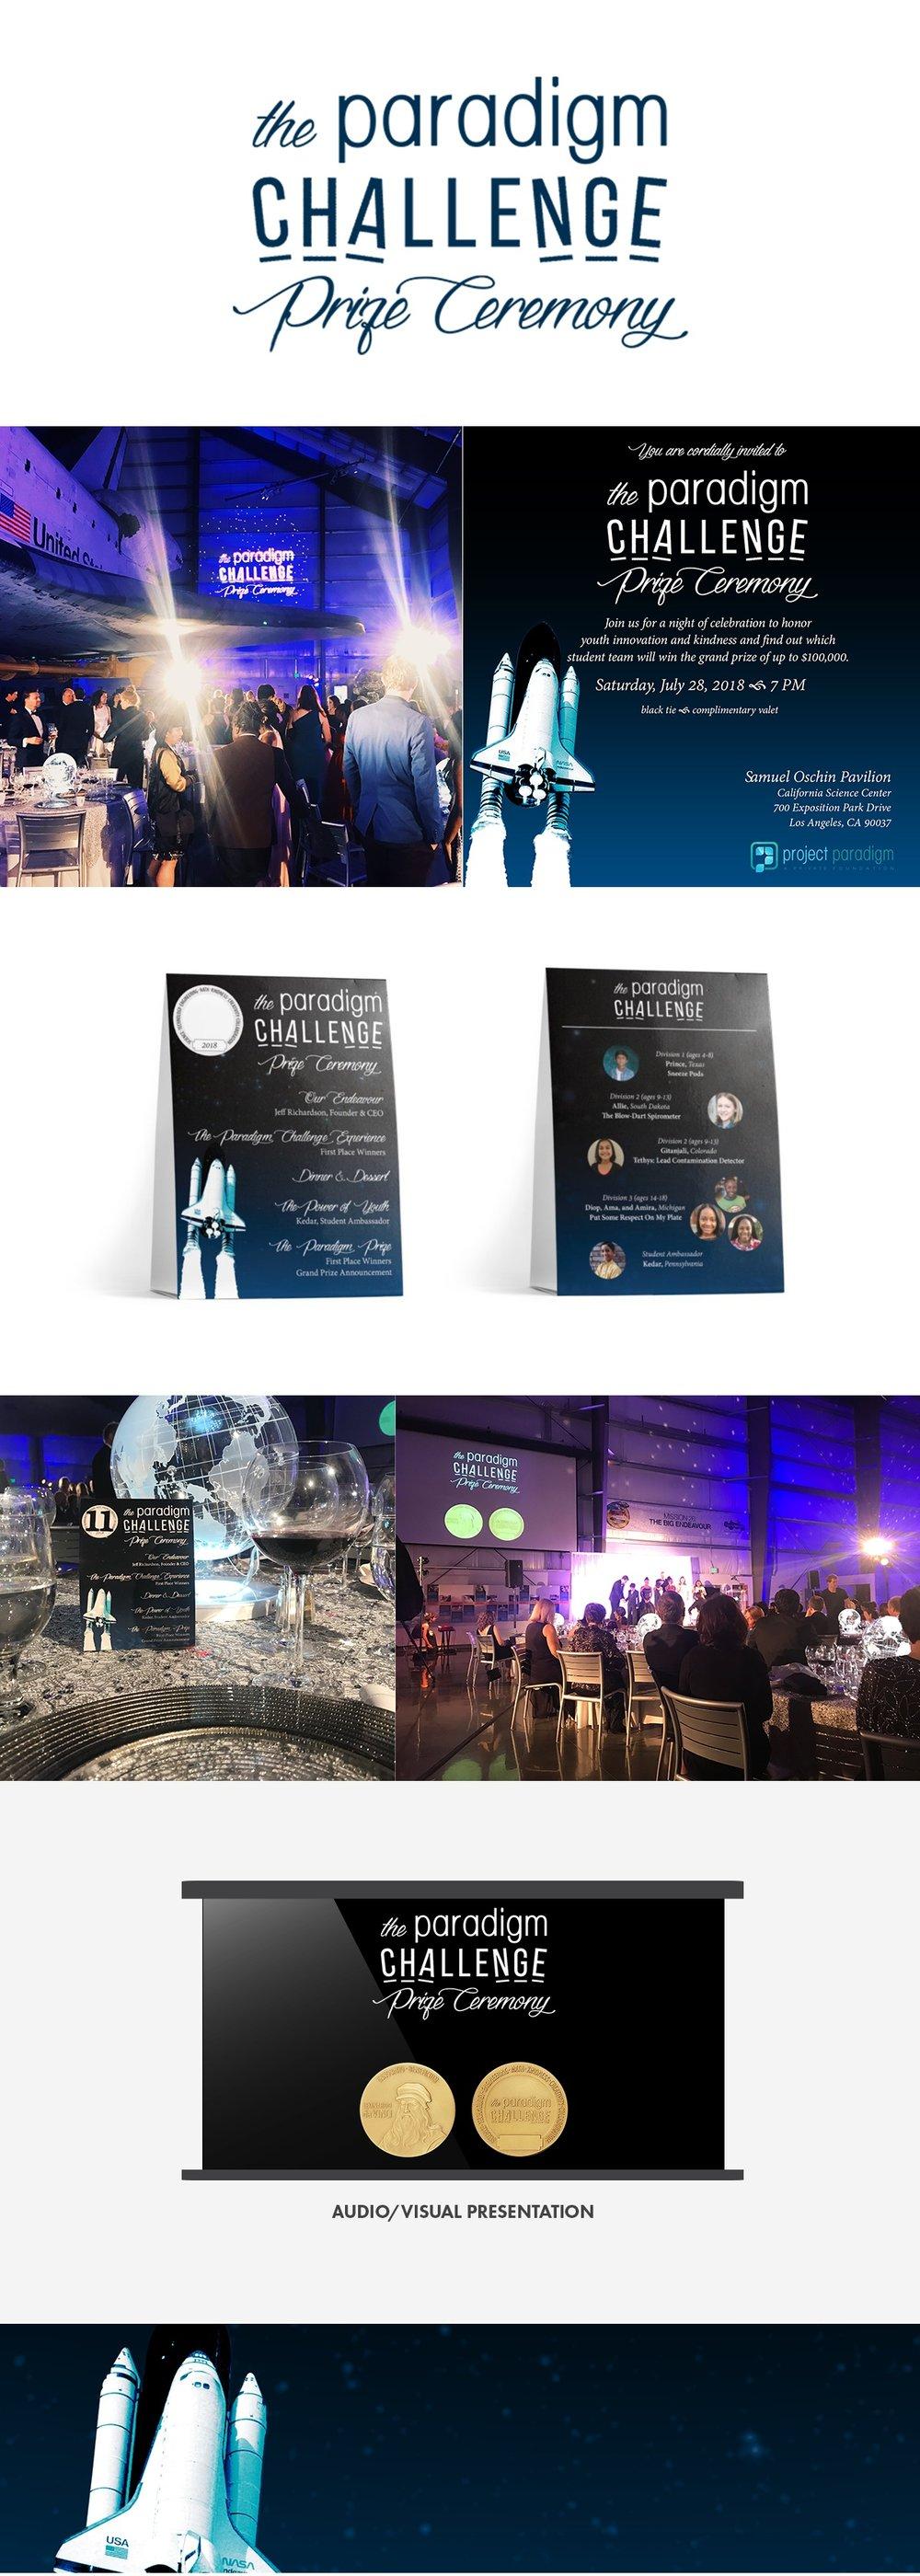 Mandalu Event Branding-Paradigm Challenge Ceremony